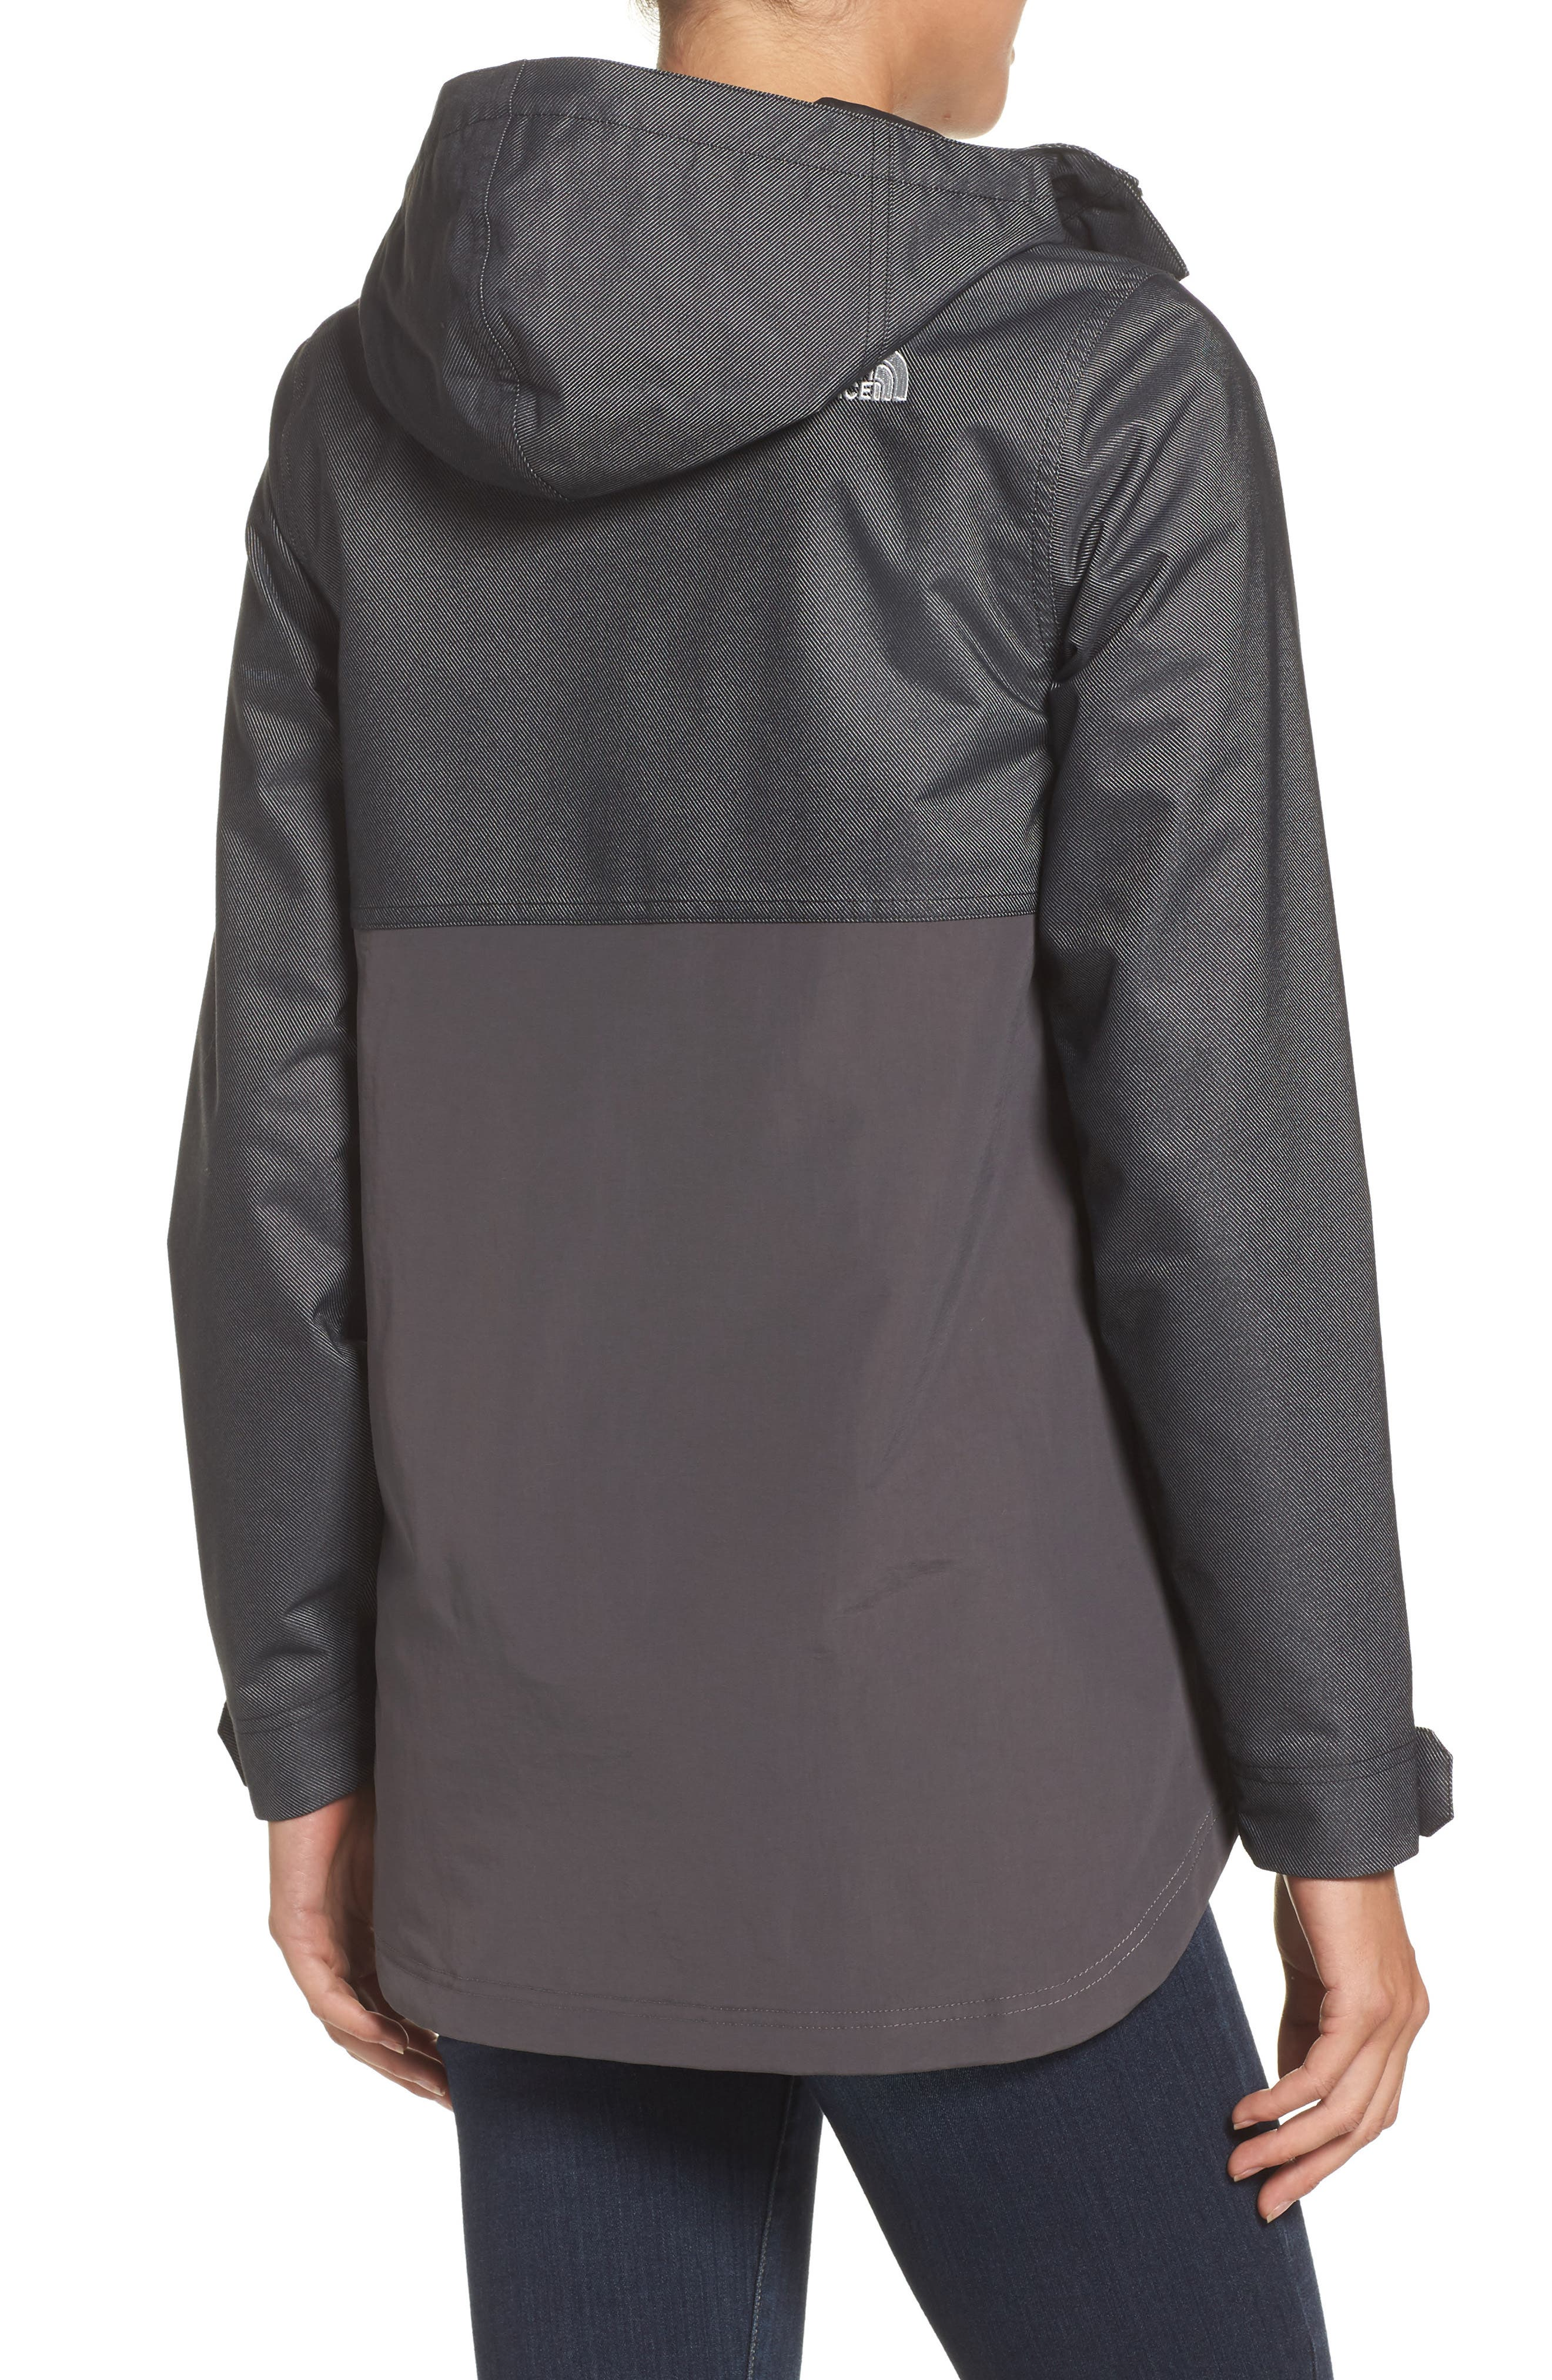 Alternate Image 2  - The North Face Cadet Anorak Rain Jacket